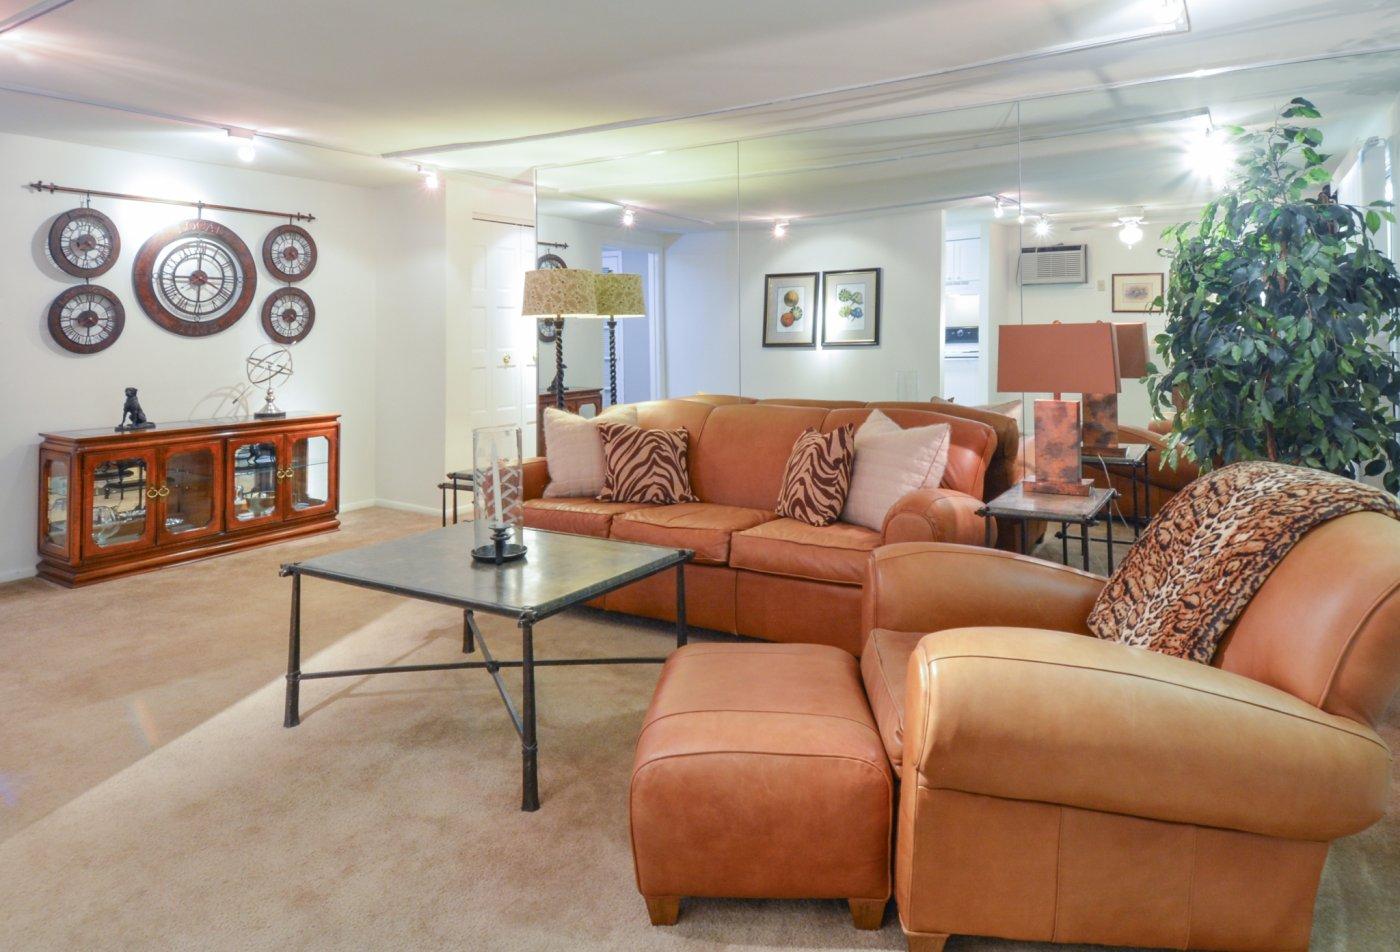 Elegant Living Room | Apartments for rent in Secane, PA | Bishop Hill Apartments